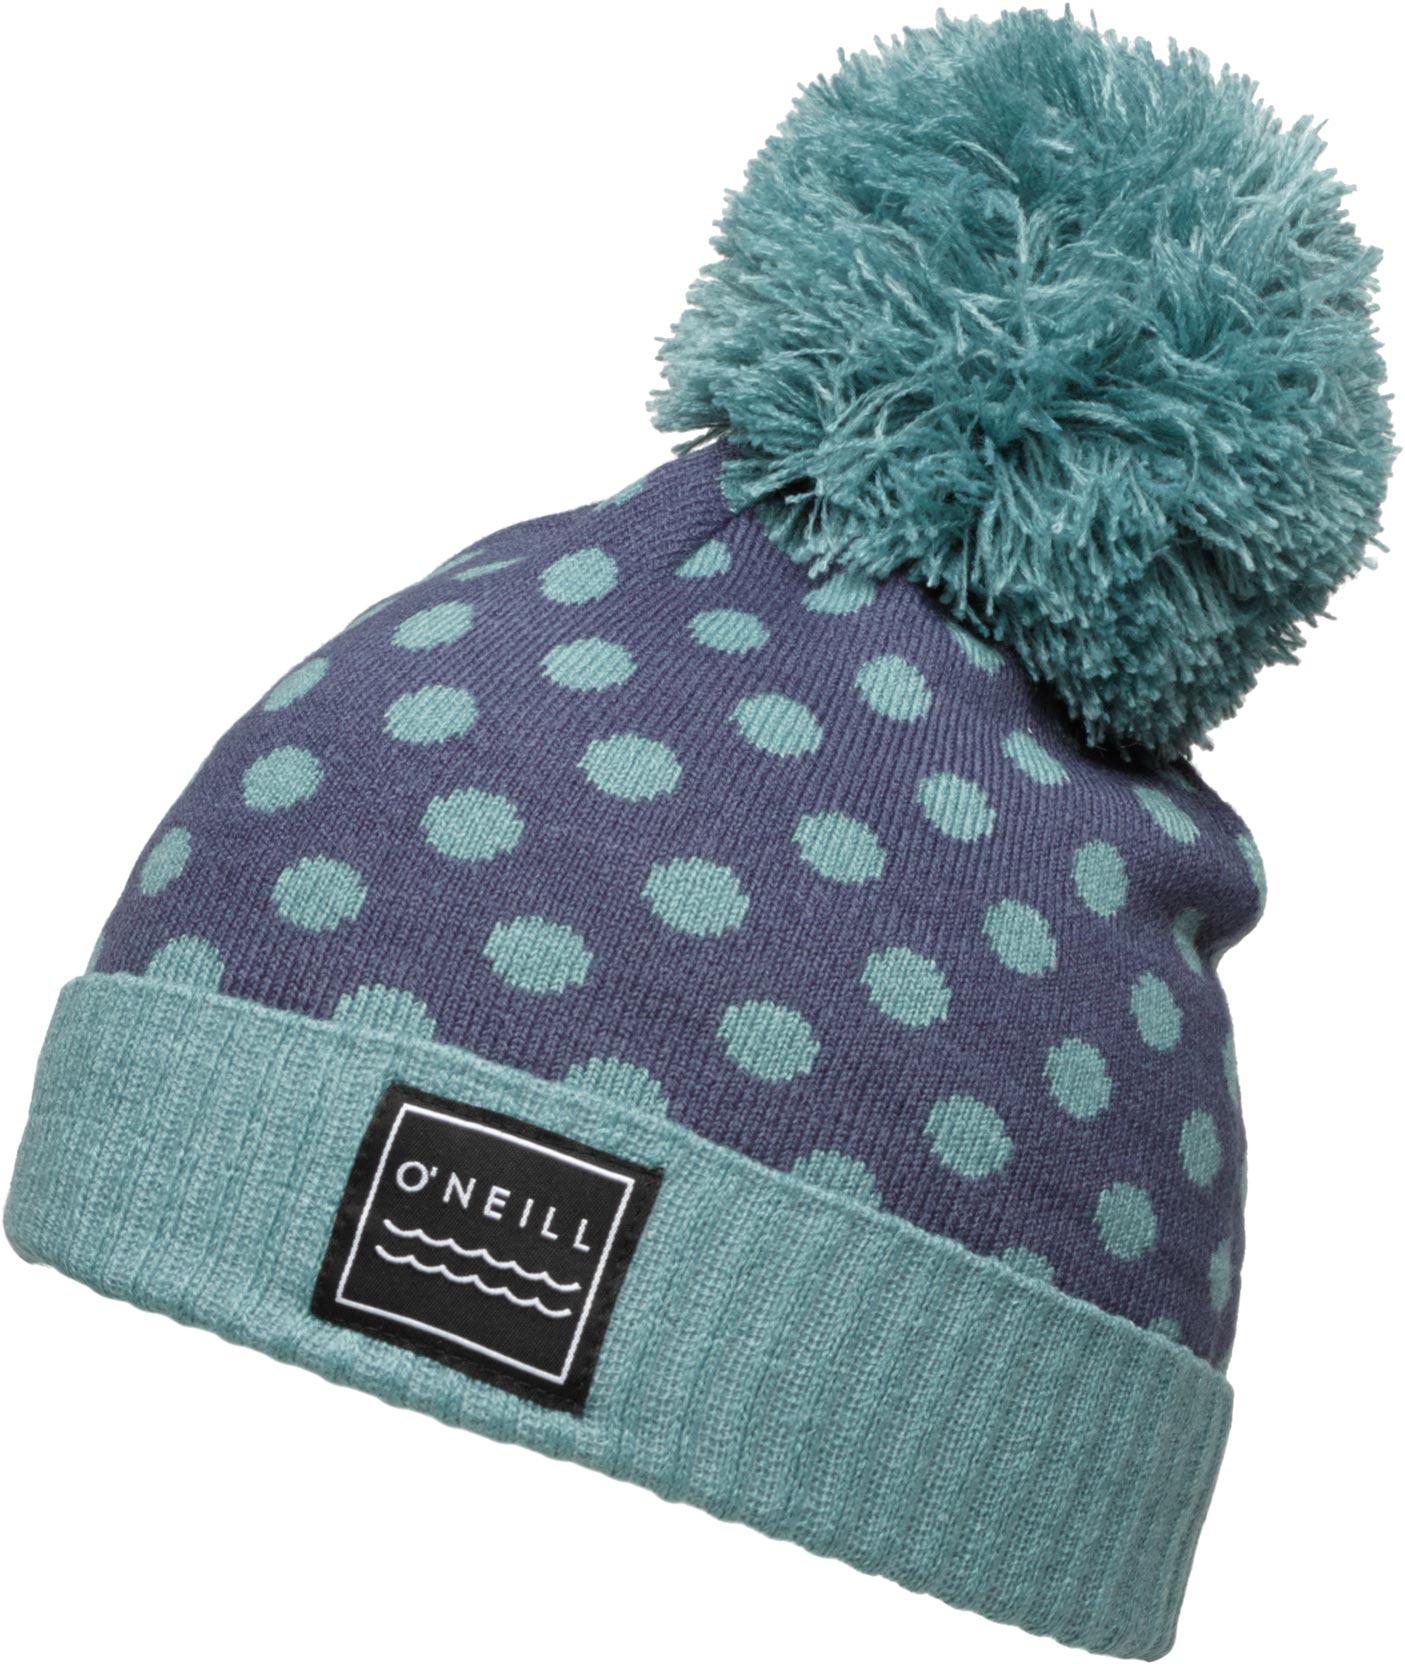 O'NEILL zimní čepice dámská AC BLITZ BEANIE blue green